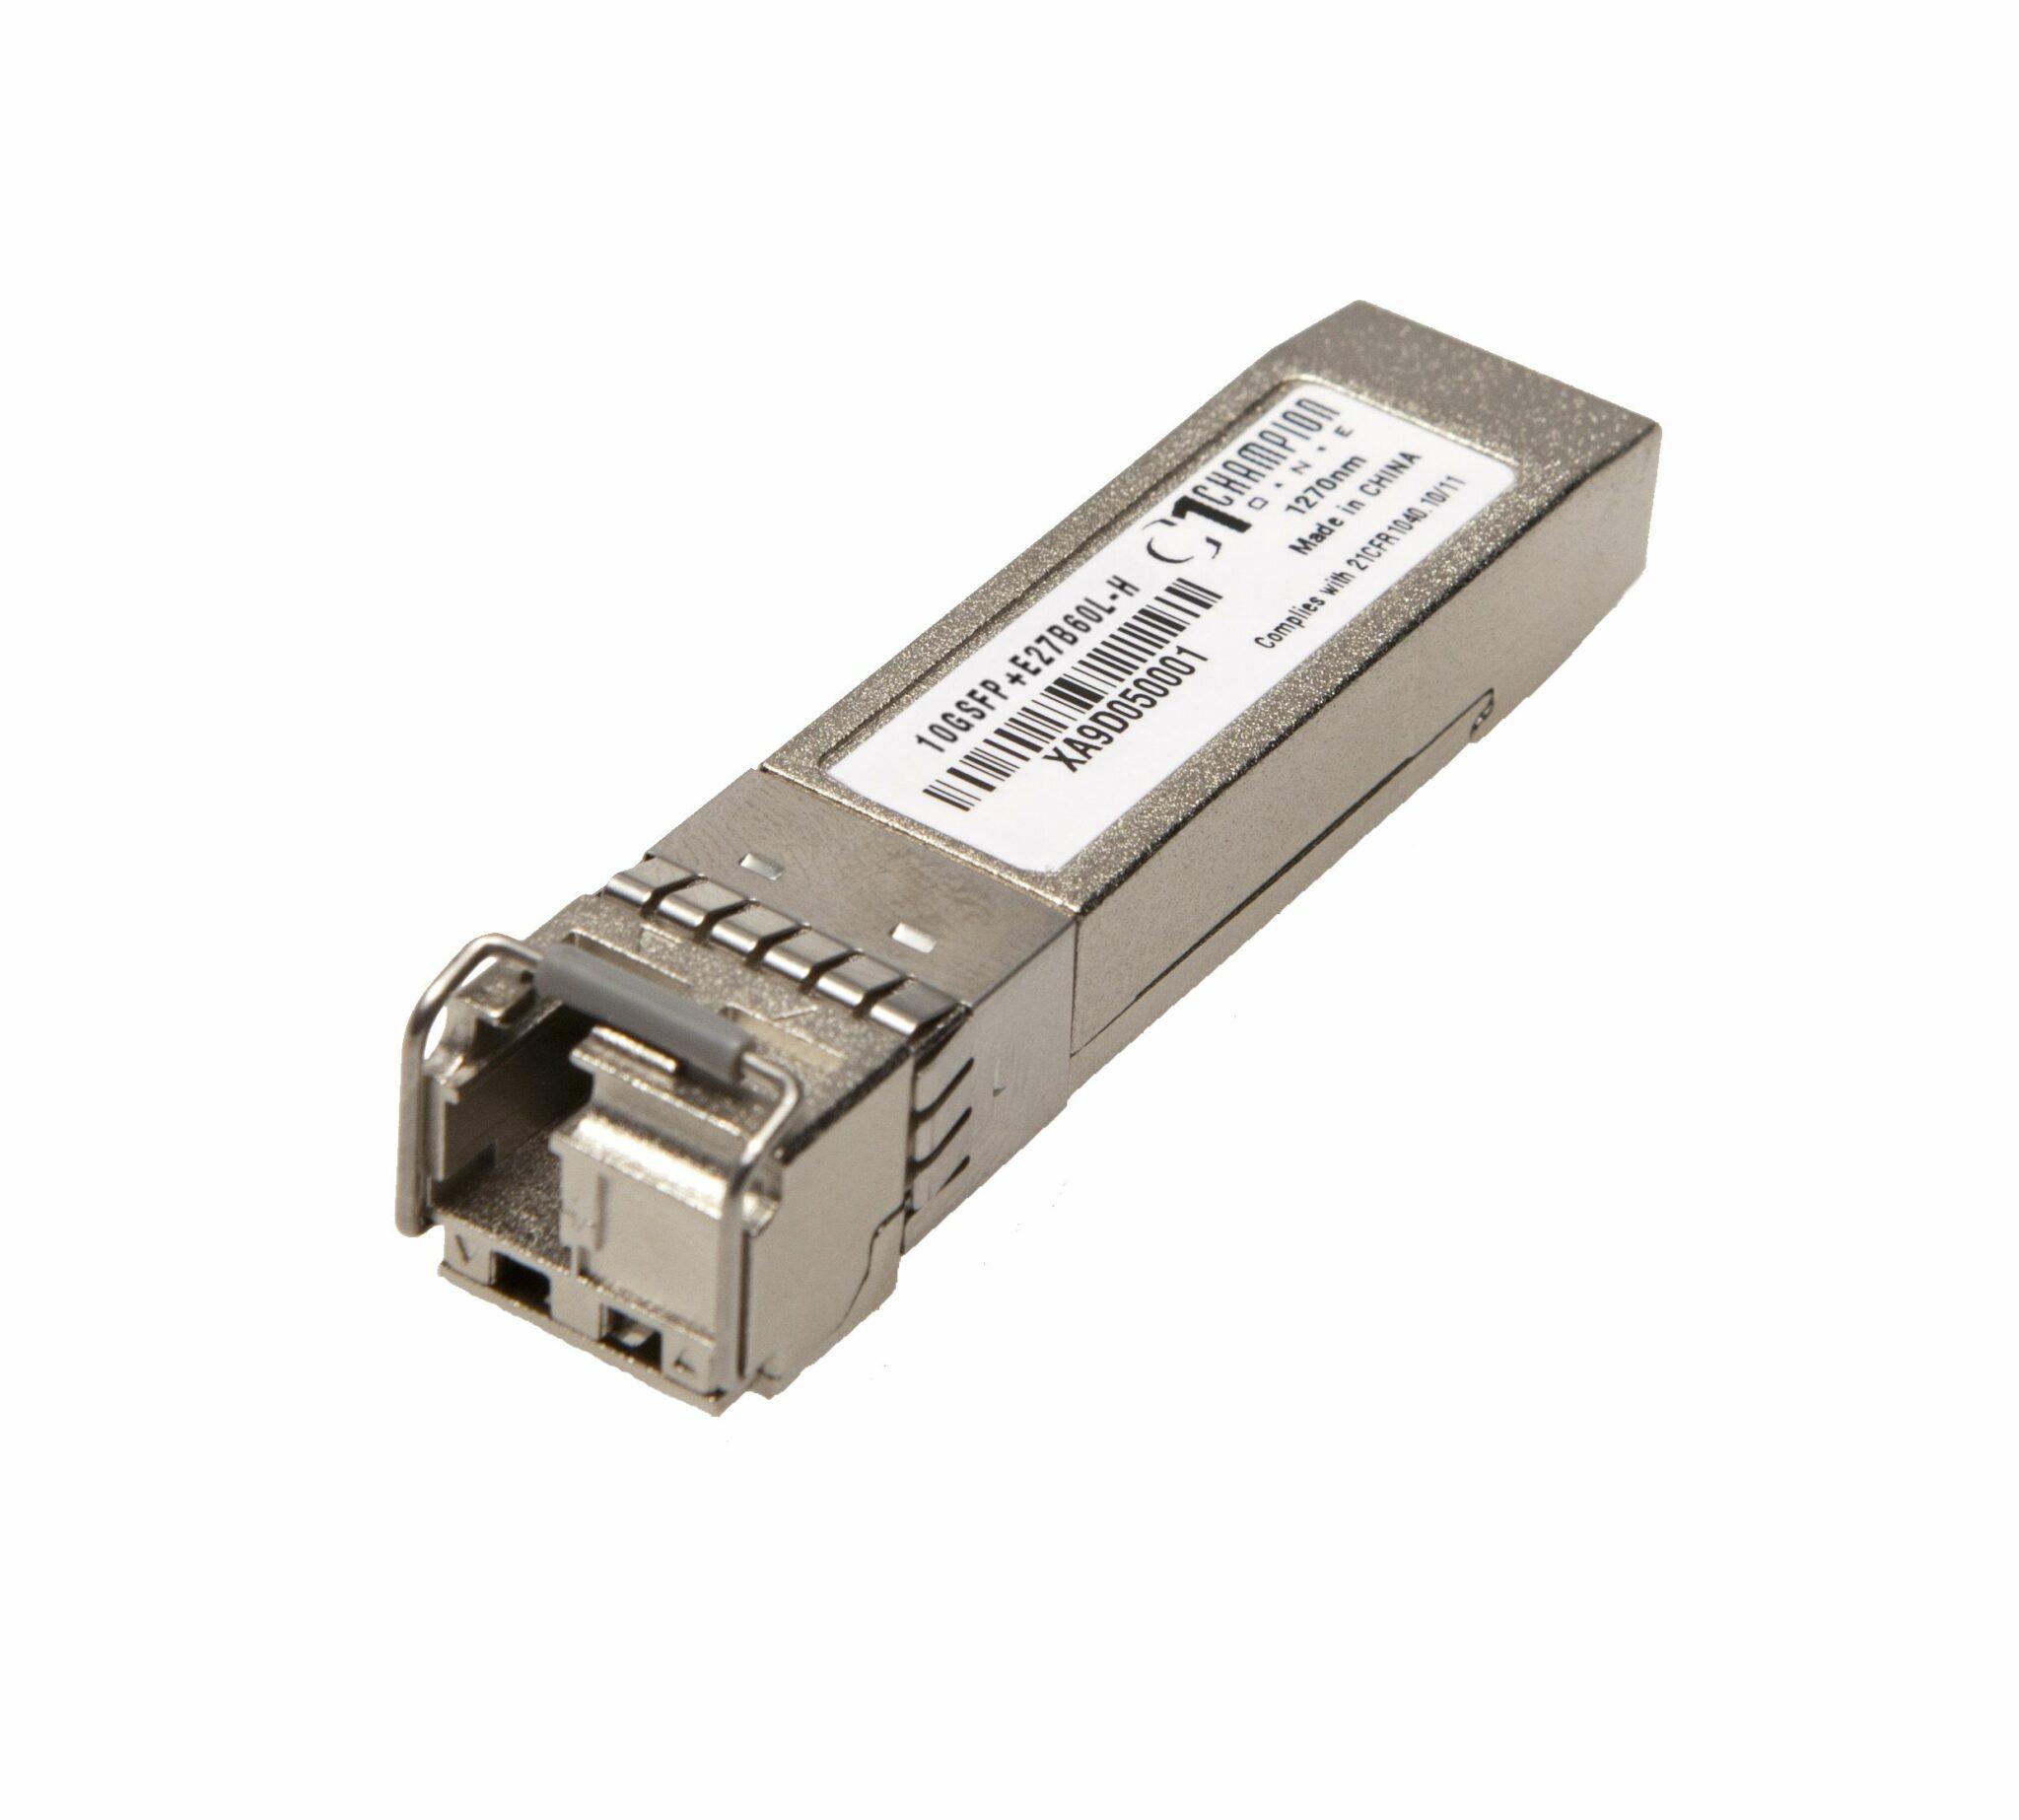 SFP+ Single Fiber 60km 10GSFP+E27B60L-H